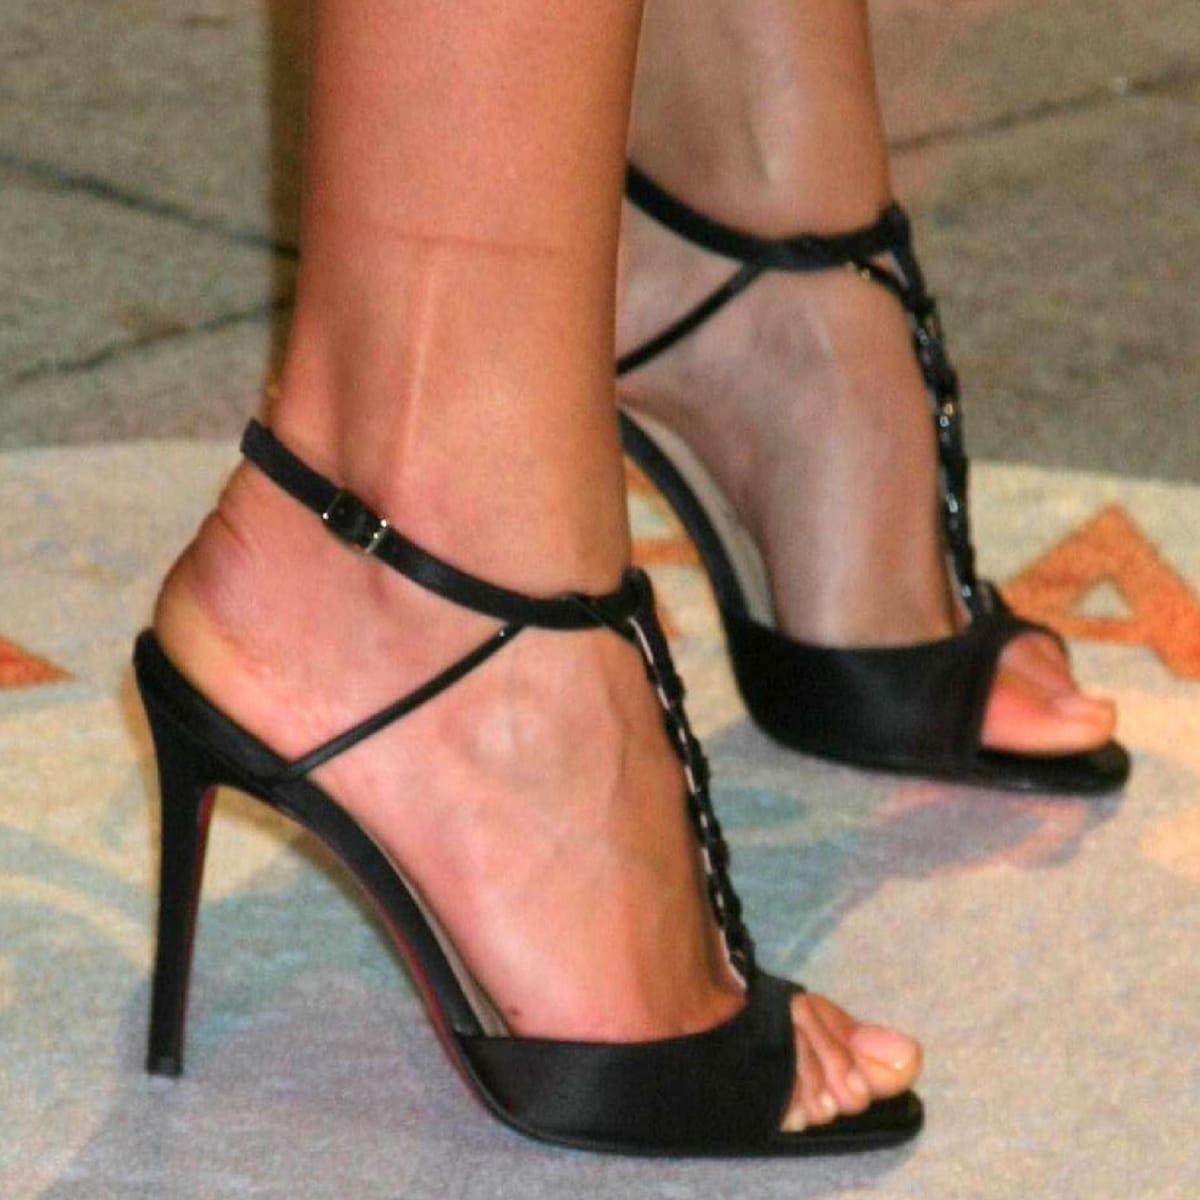 Karolina Kurkova shows off her size 9 (US) feet at the Vanity Fair 2006 Oscar Party